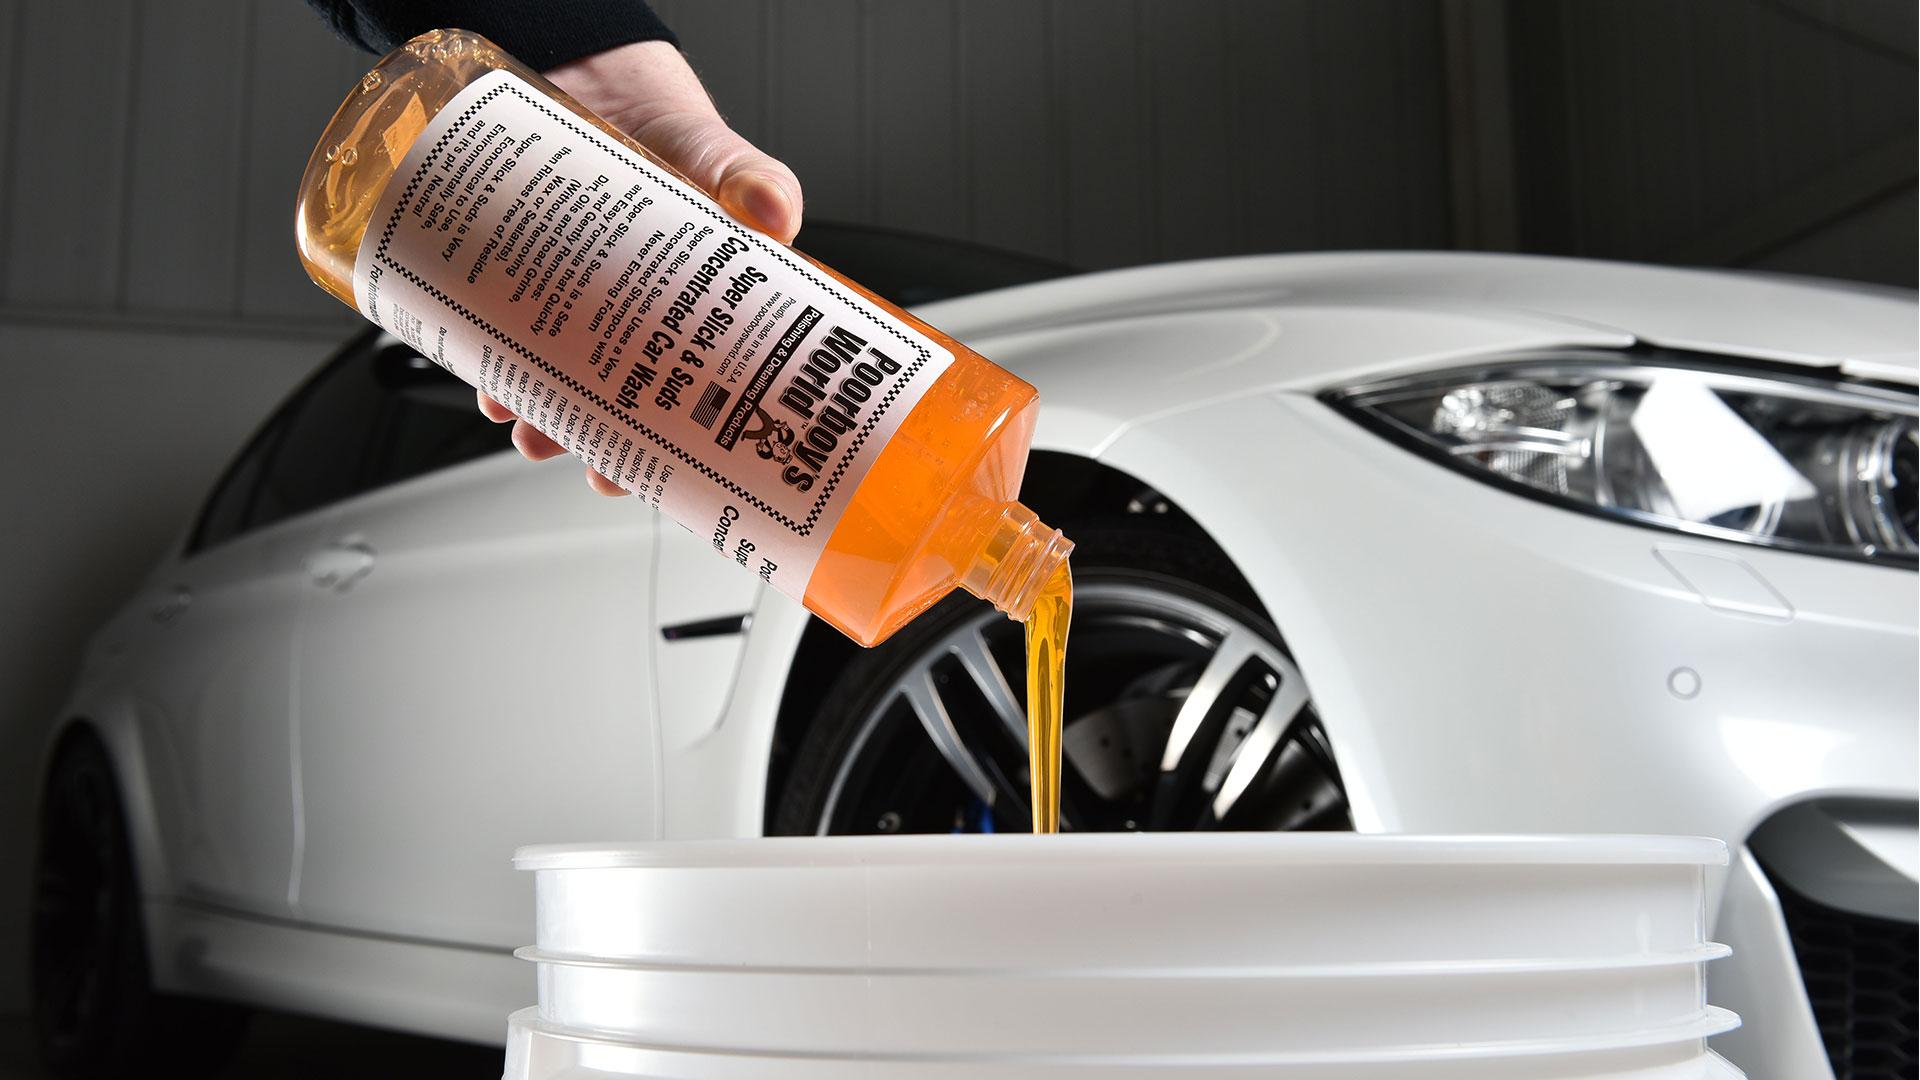 Car Washing Products